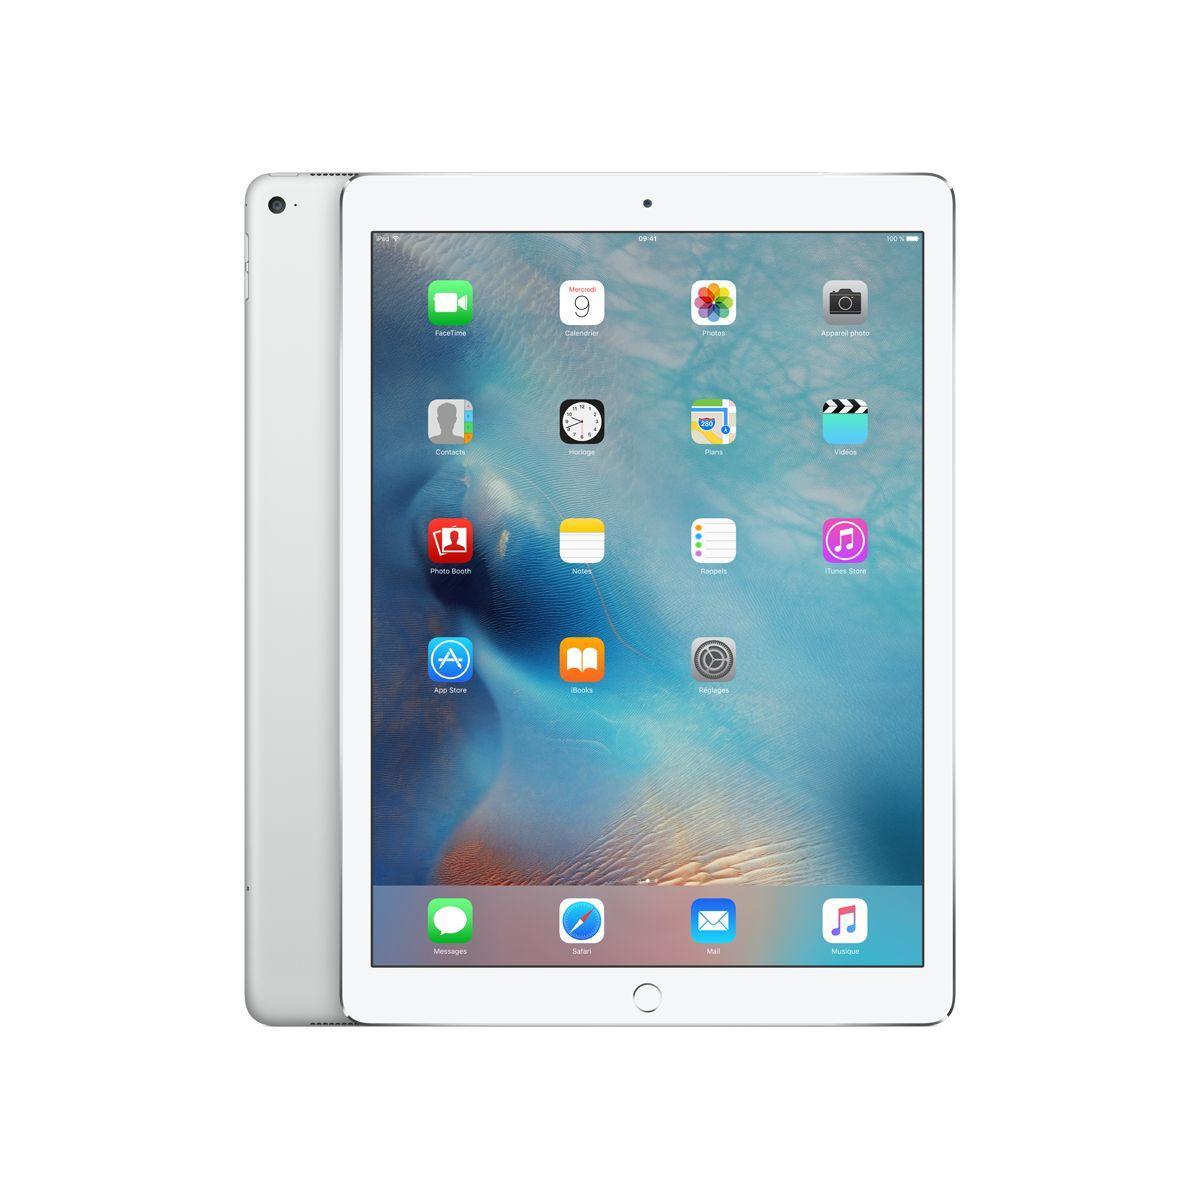 Apple ipad pro 12.9 128go cellular argent (photo)